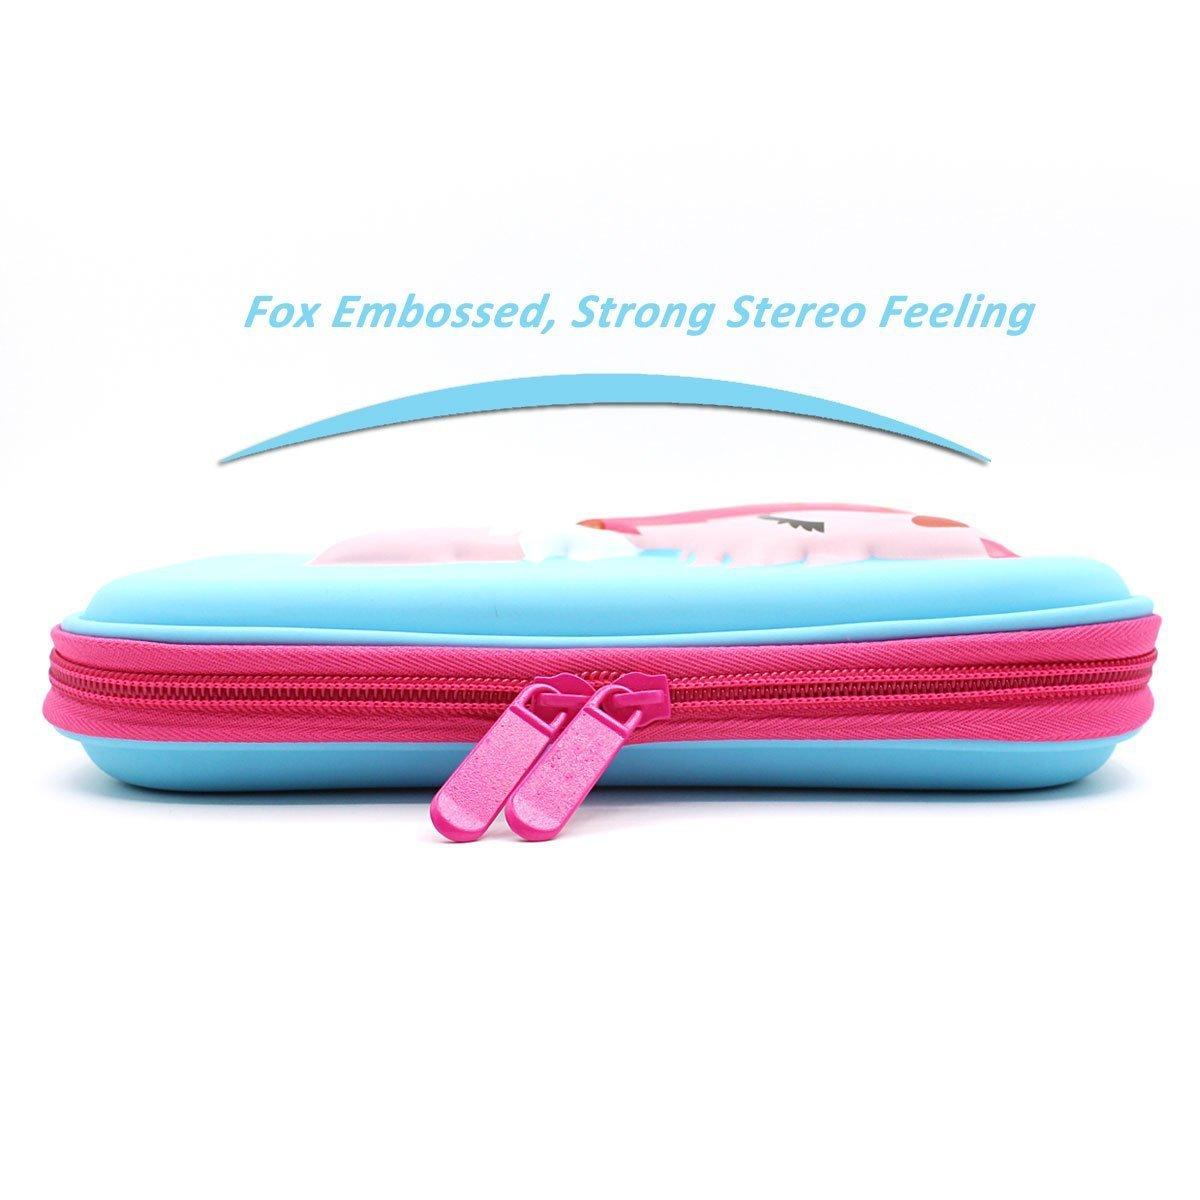 Amazon.com : SOOCUTE Elegant Fox Hardtop Pencil Holder Cute EVA Pencil Case  With Big Capacity For Kids (Blue) : Office Products